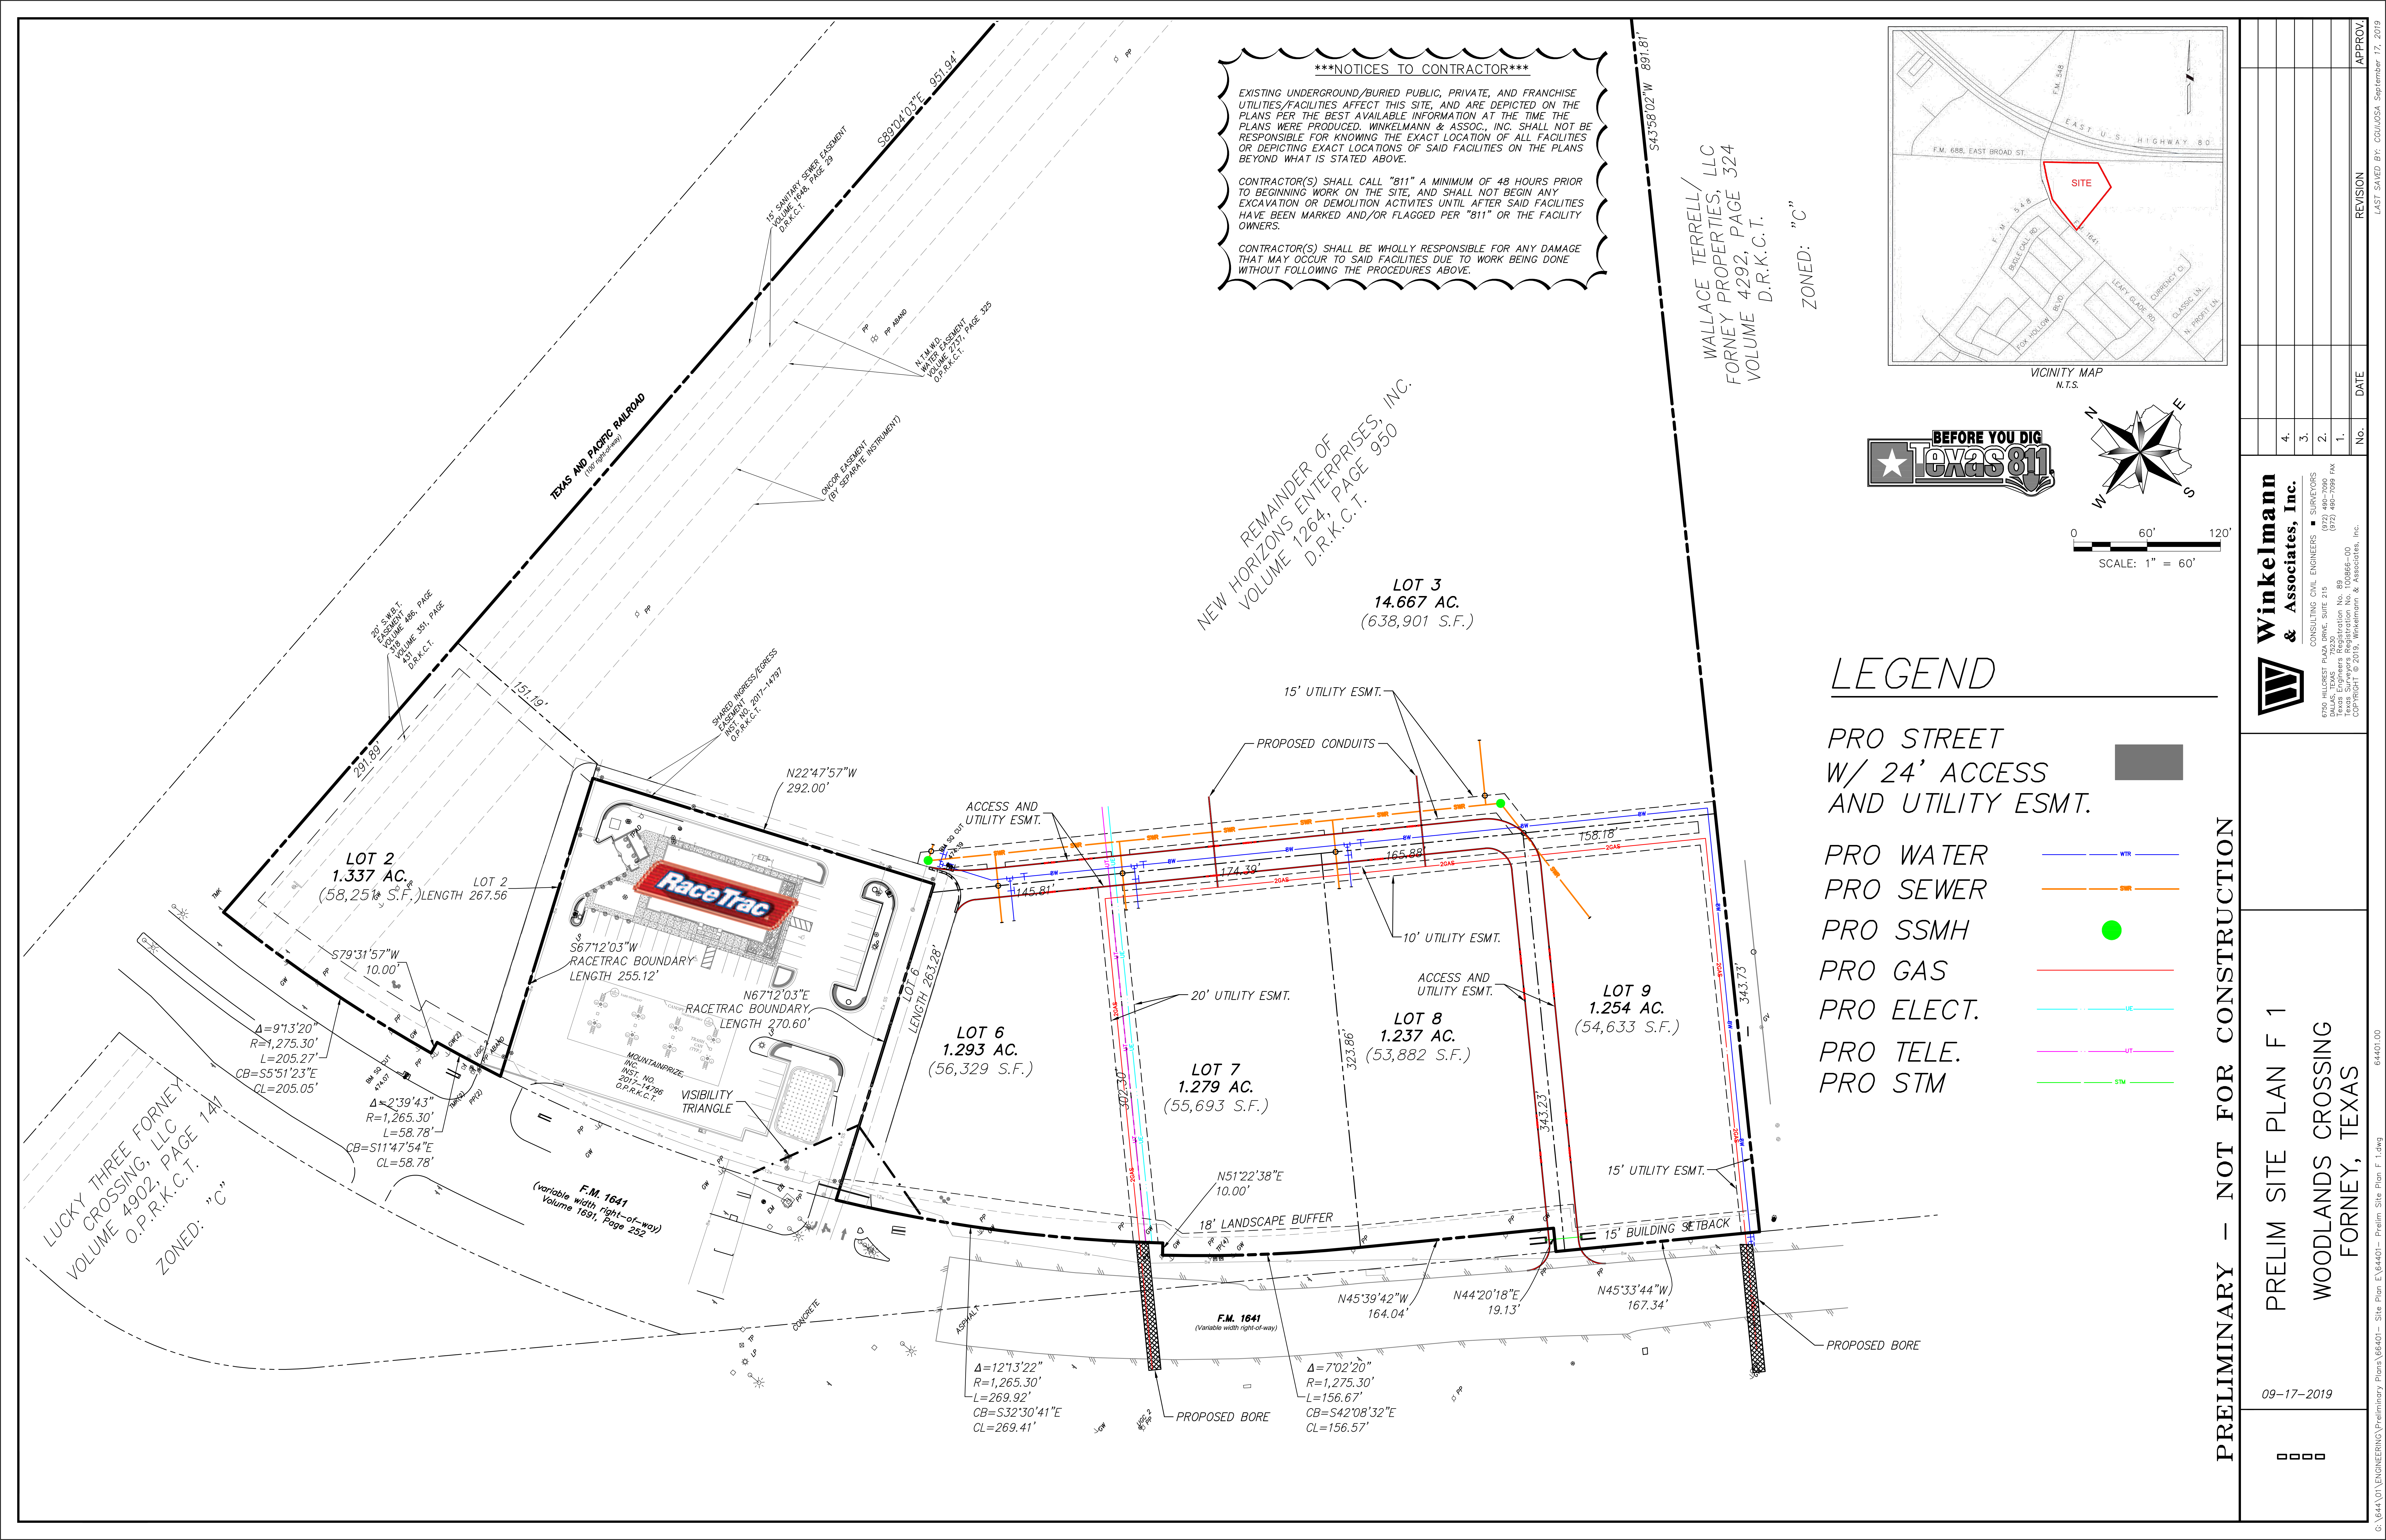 SEQ US 80 & FM 548: site plan